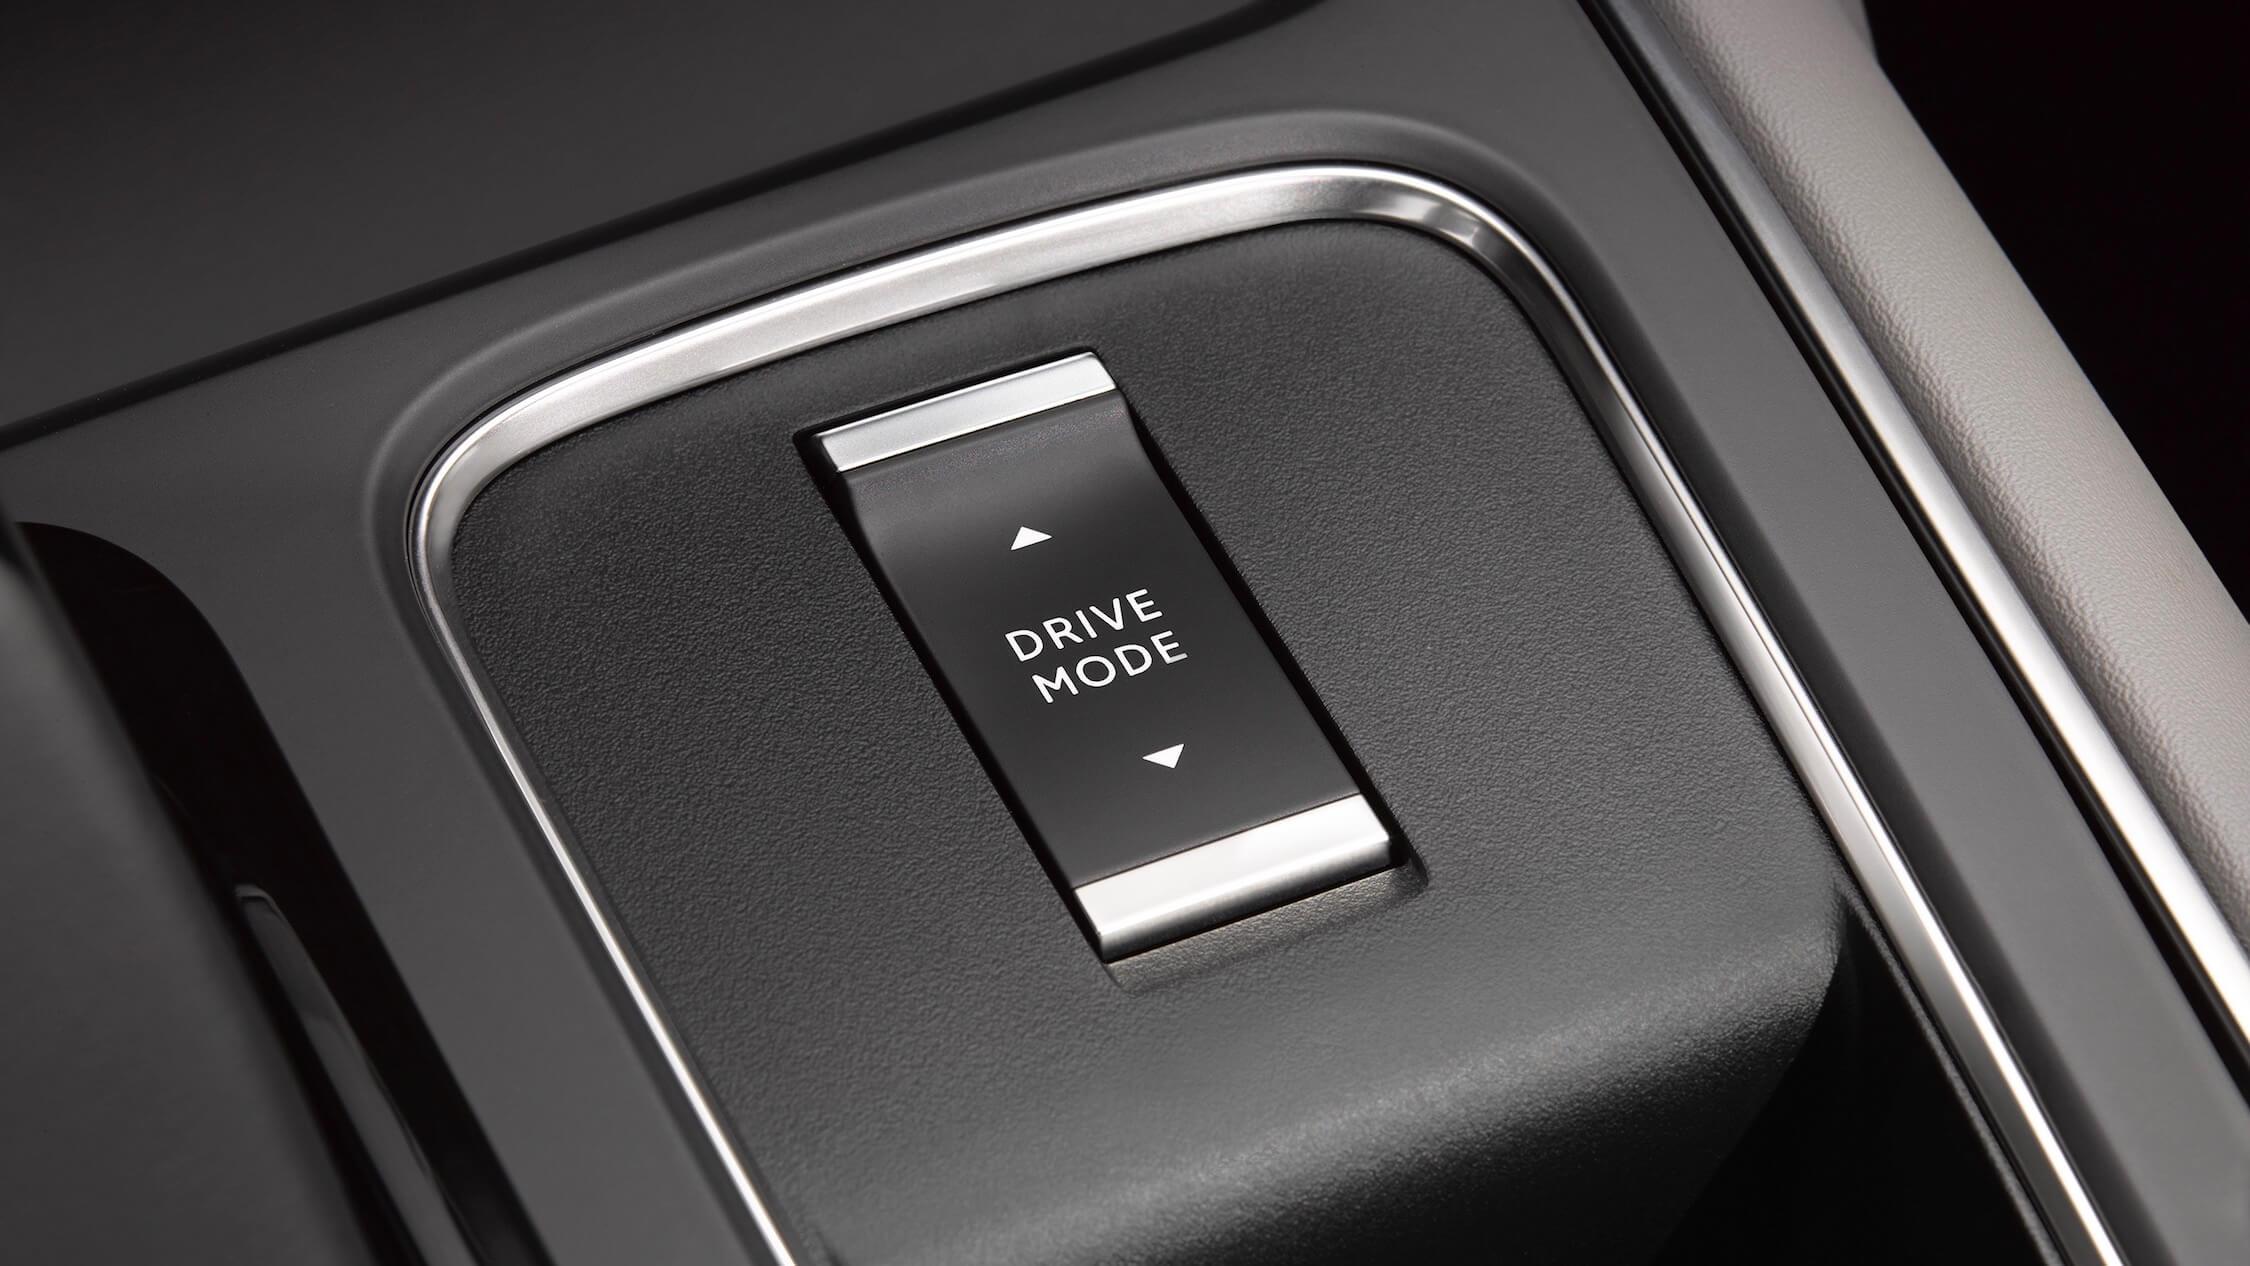 Citroen C5 hybride drive mode